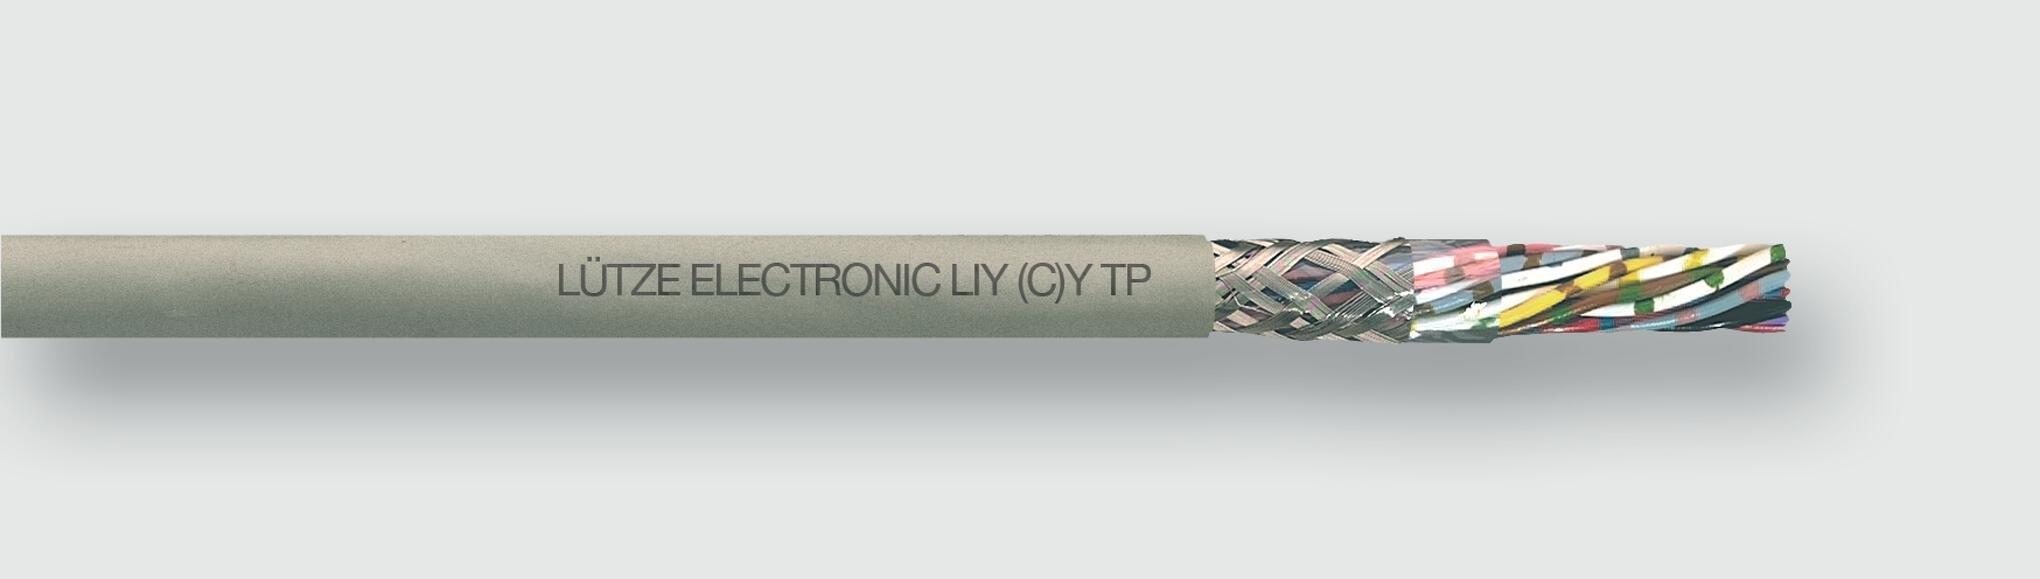 ELECTRONIC LiY(C)Y TP